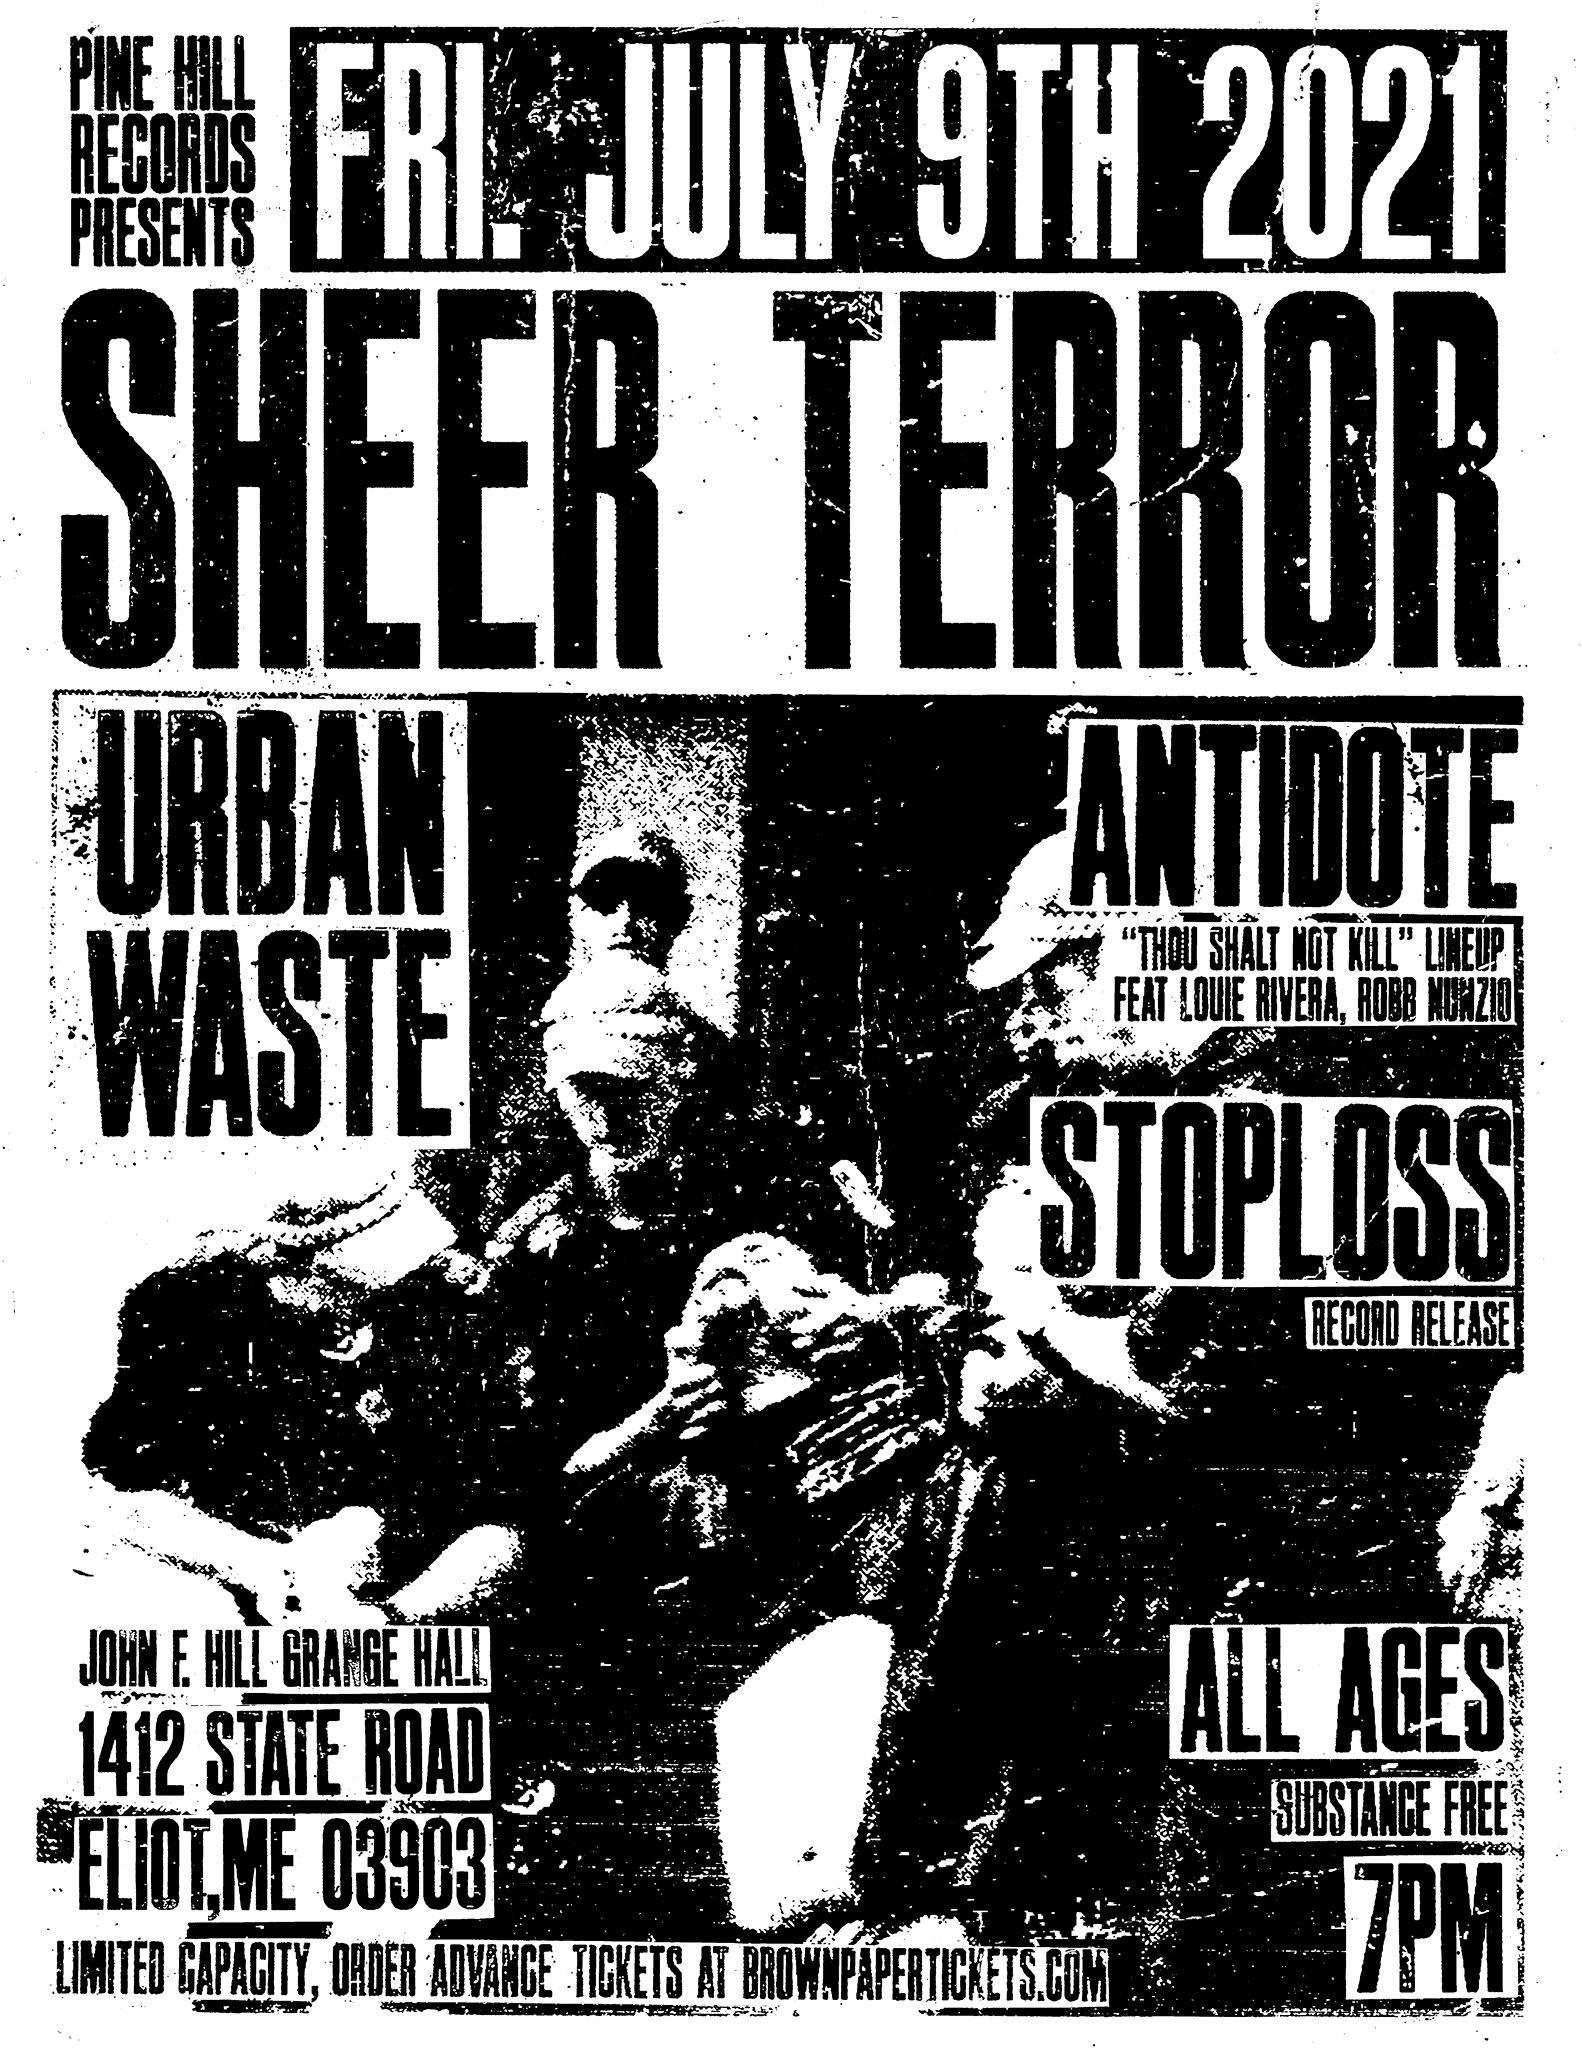 Antidote - Urban Waste - Live Show